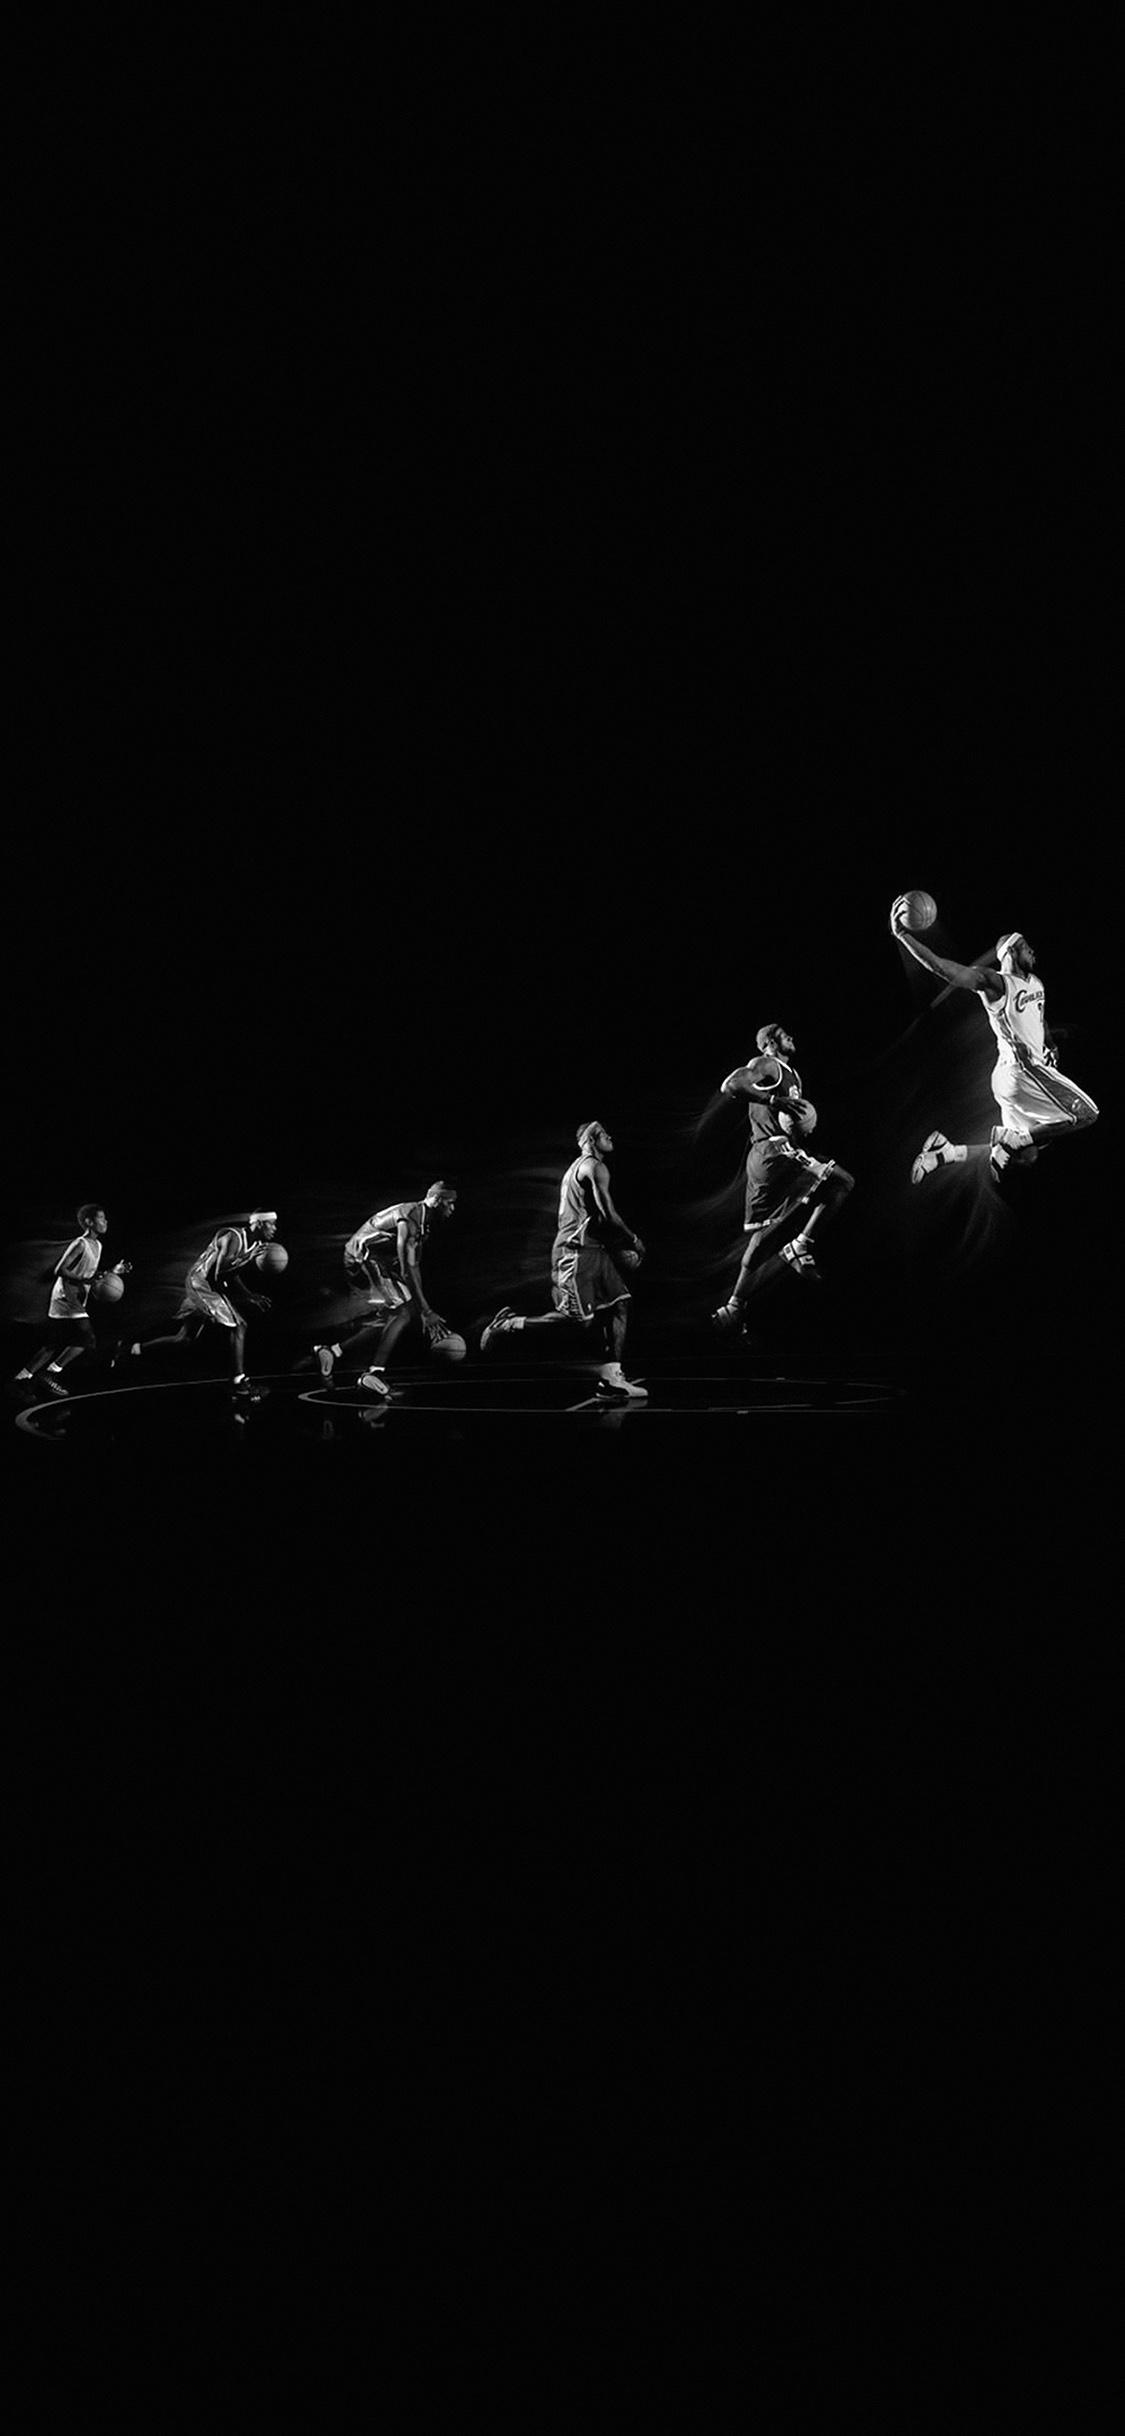 iPhoneXpapers.com-Apple-iPhone-wallpaper-hi04-lebron-james-nba-basketball-sports-dark-art-bw